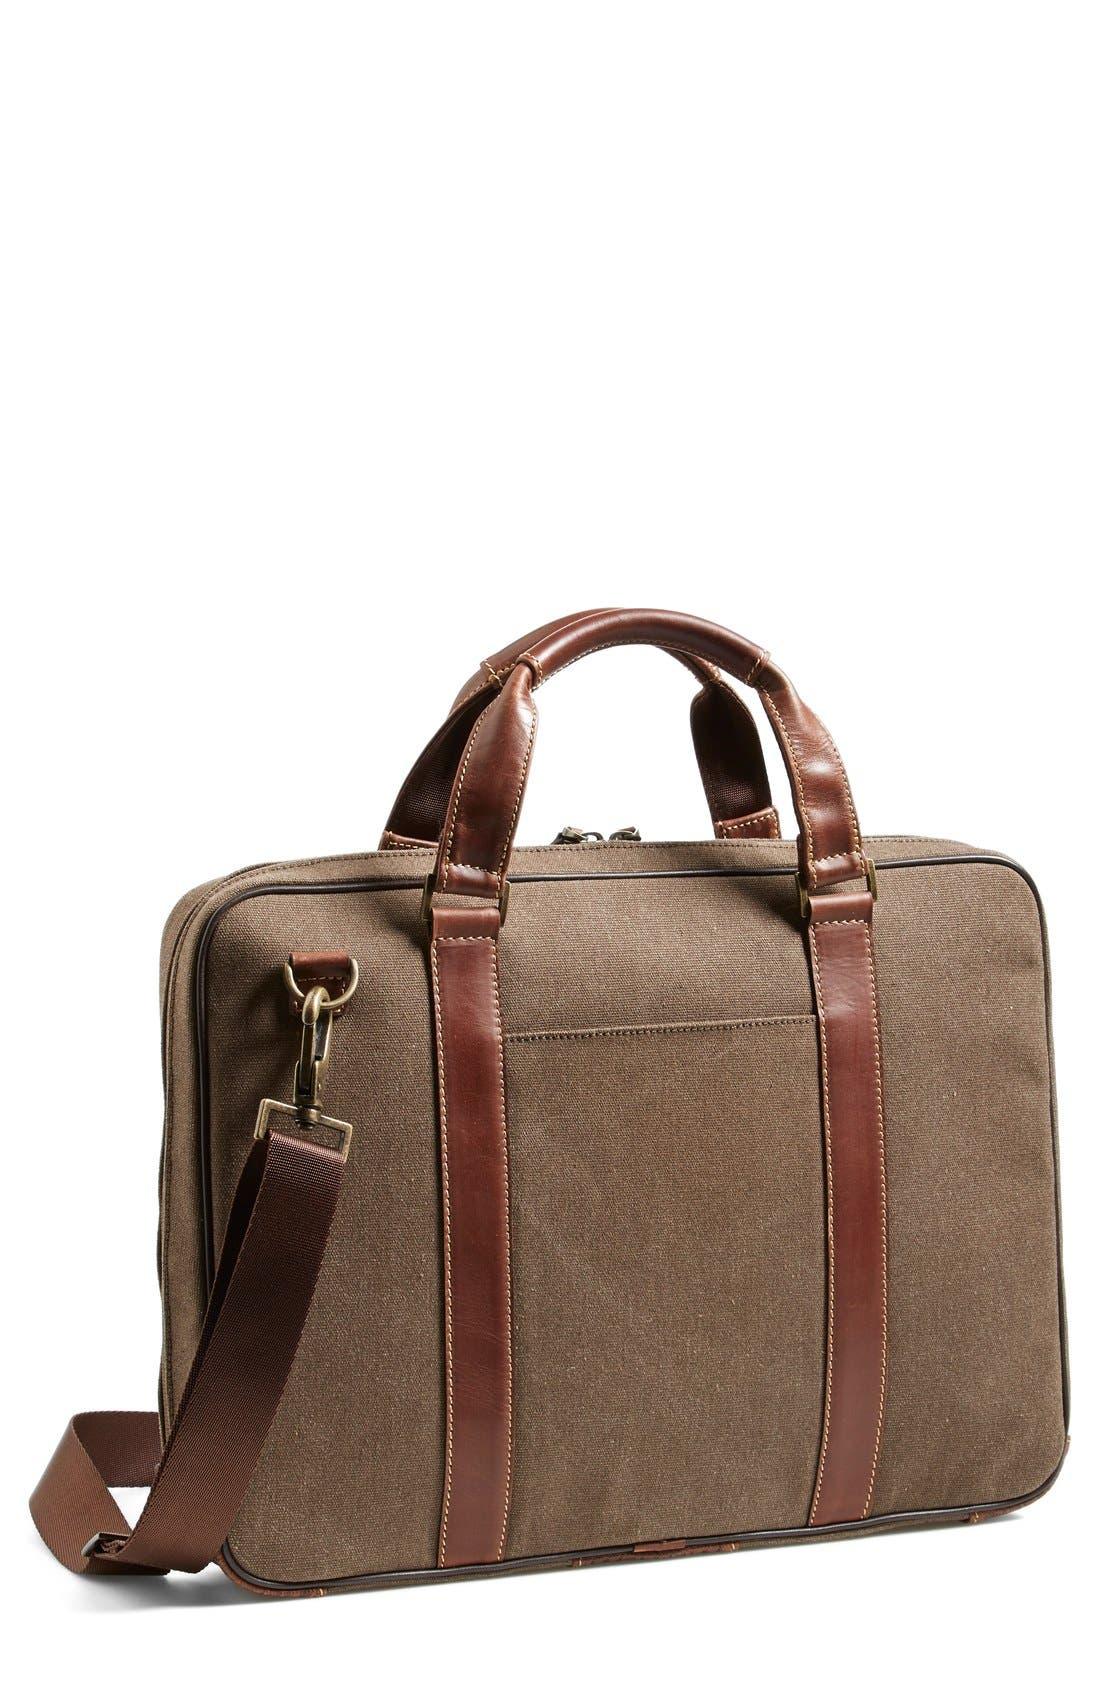 Bryant Zipster Briefcase